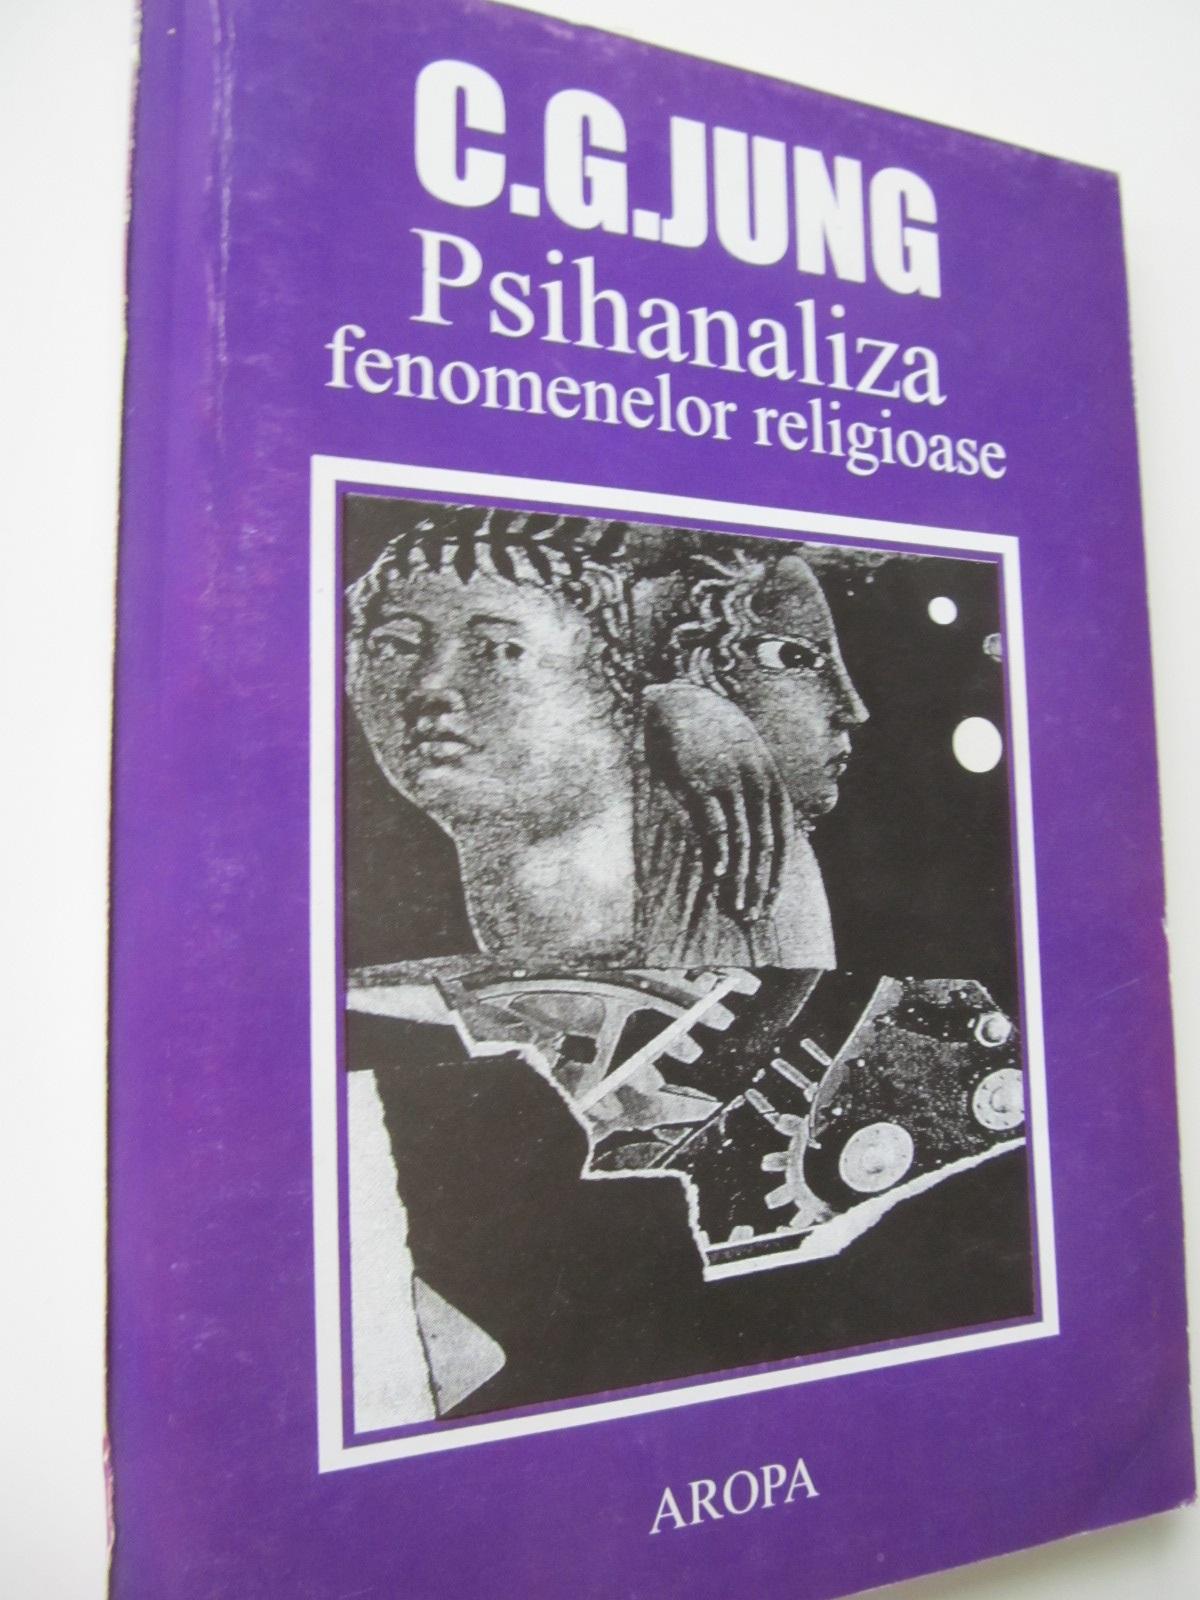 Psihanaliza fenomenelor religioase - C. G. Jung | Detalii carte